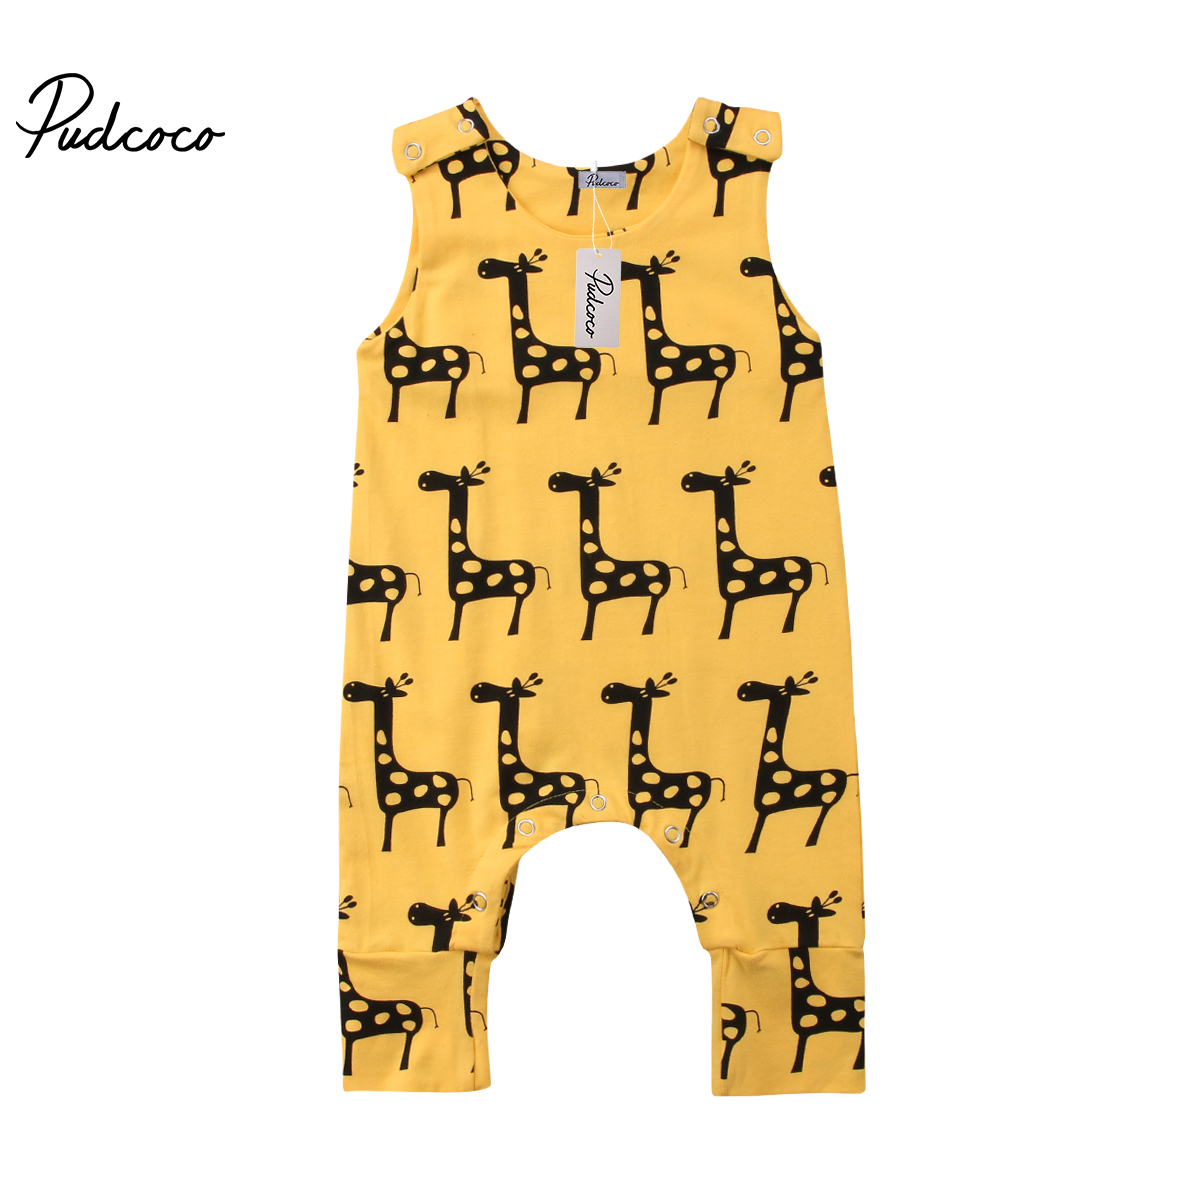 2018 Brand New 0-24M Cute Newborn Baby Boy Girl Sleeveless Cartoon Animal Cotton Romper Jumpsuit Outfits Summer Clothes